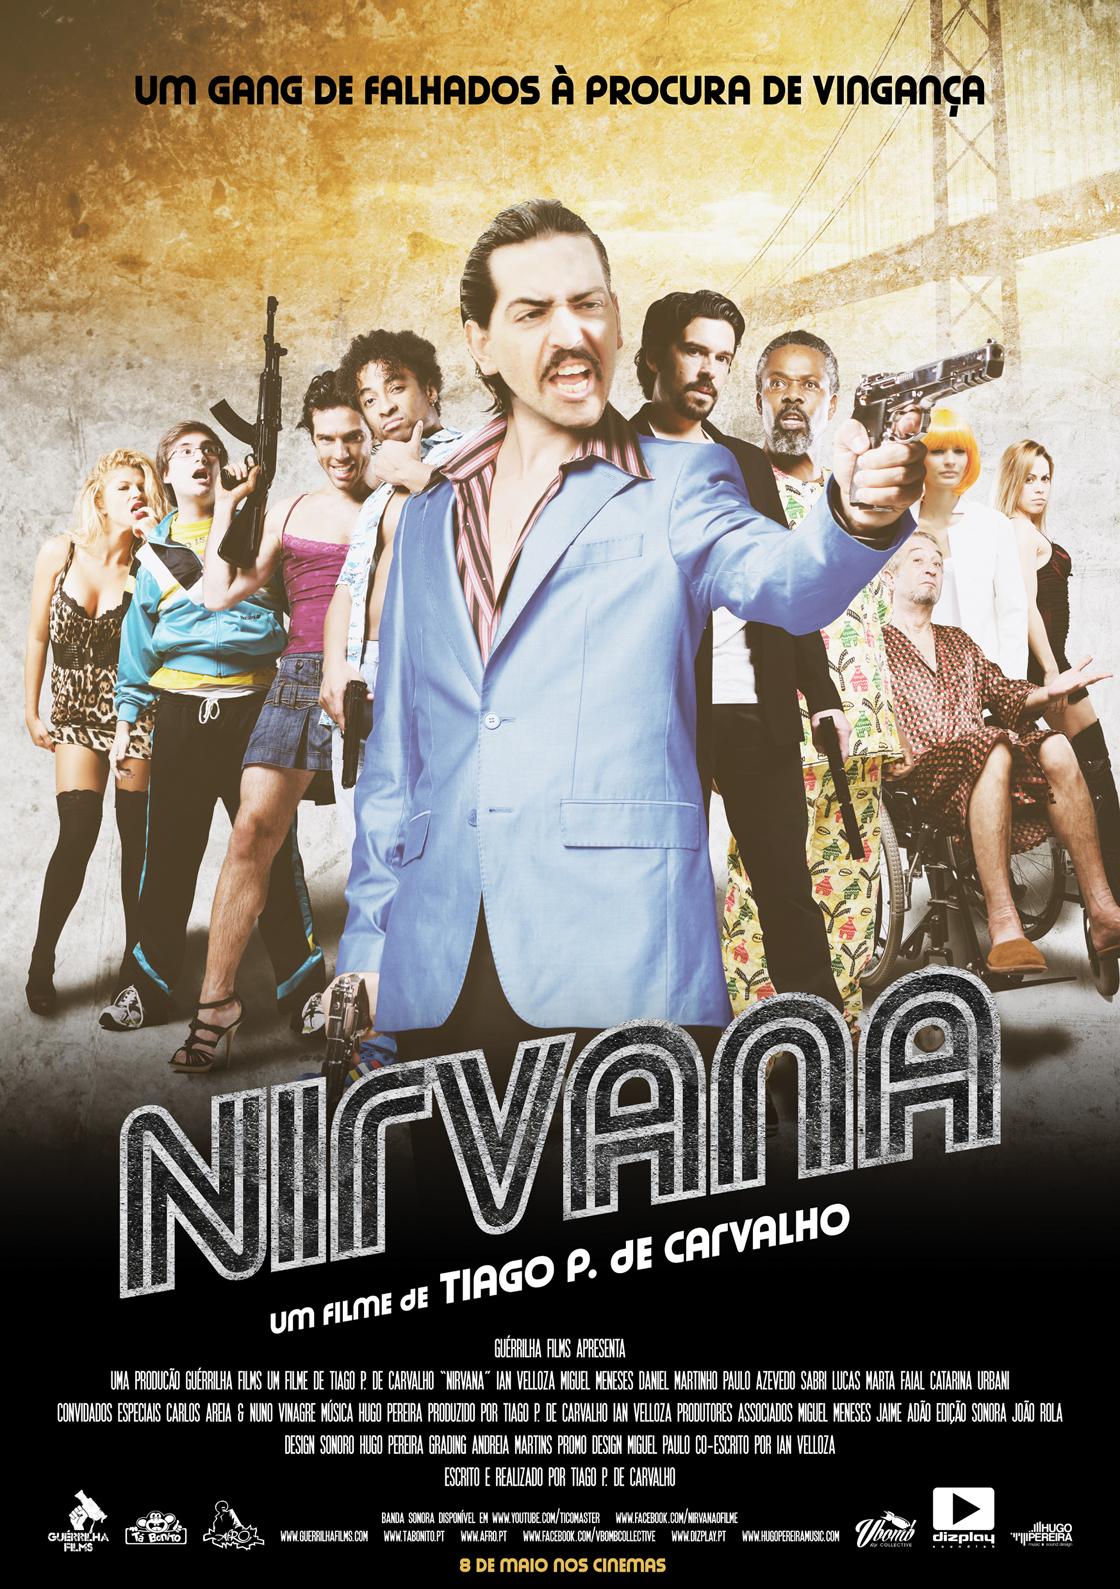 PRINT01_Nirvana02